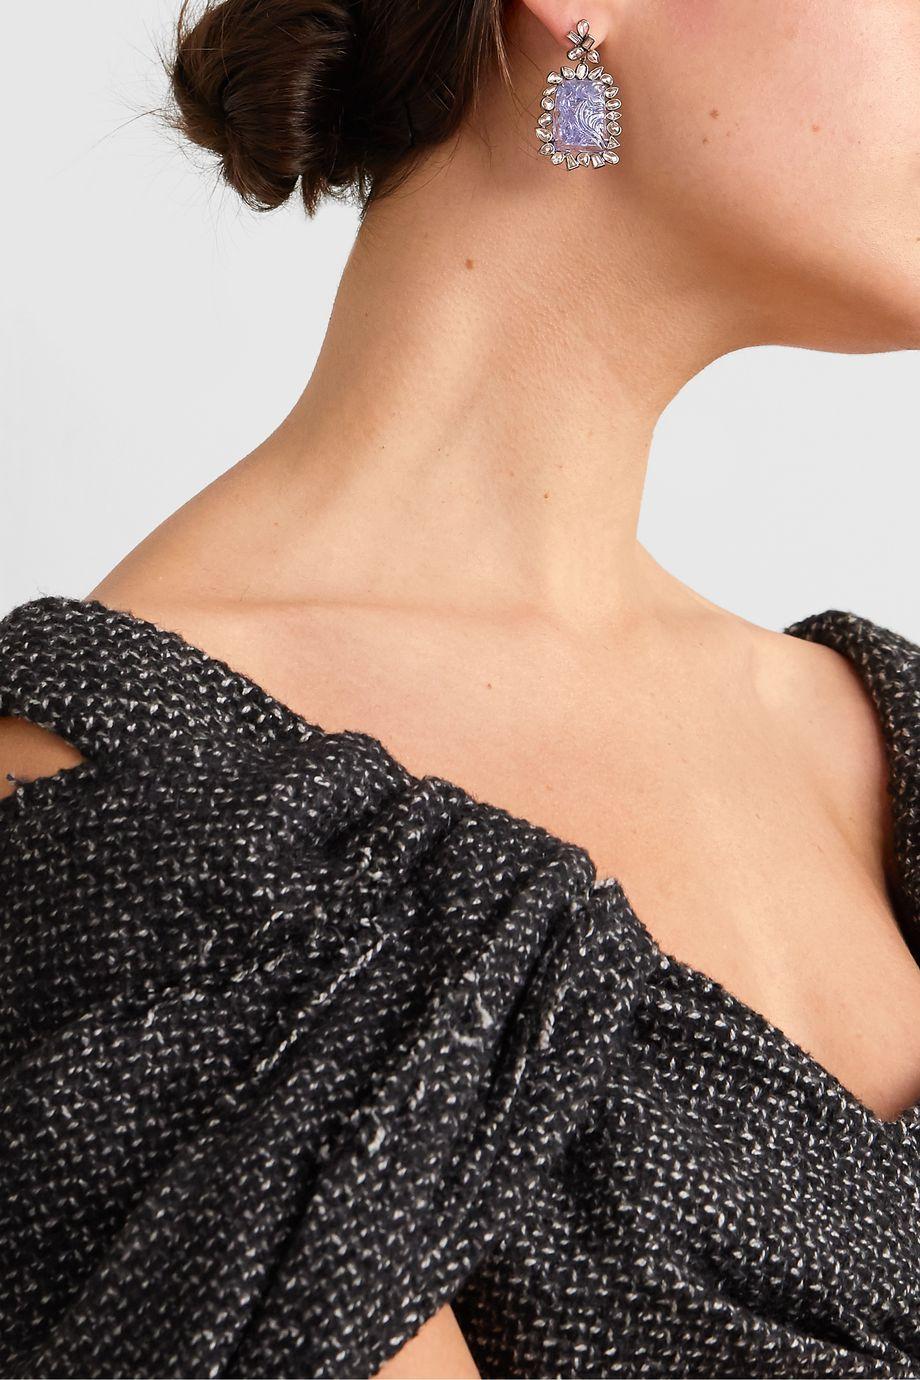 Kimberly McDonald Ohrringe aus geschwärztem Platin mit Tansaniten und Diamanten